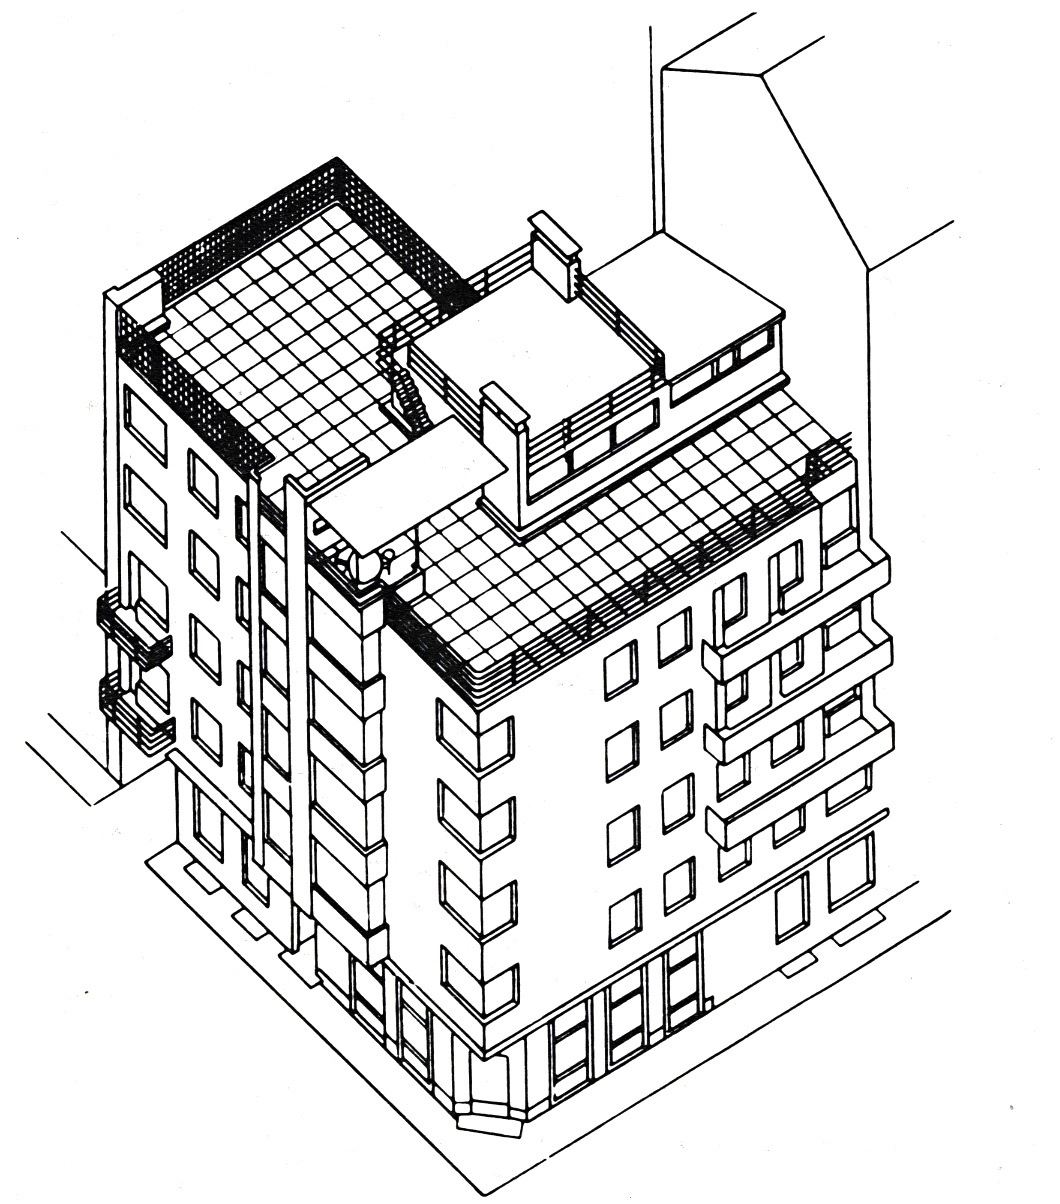 Apartment Building Drawing beautiful apartment building drawing popular design concept